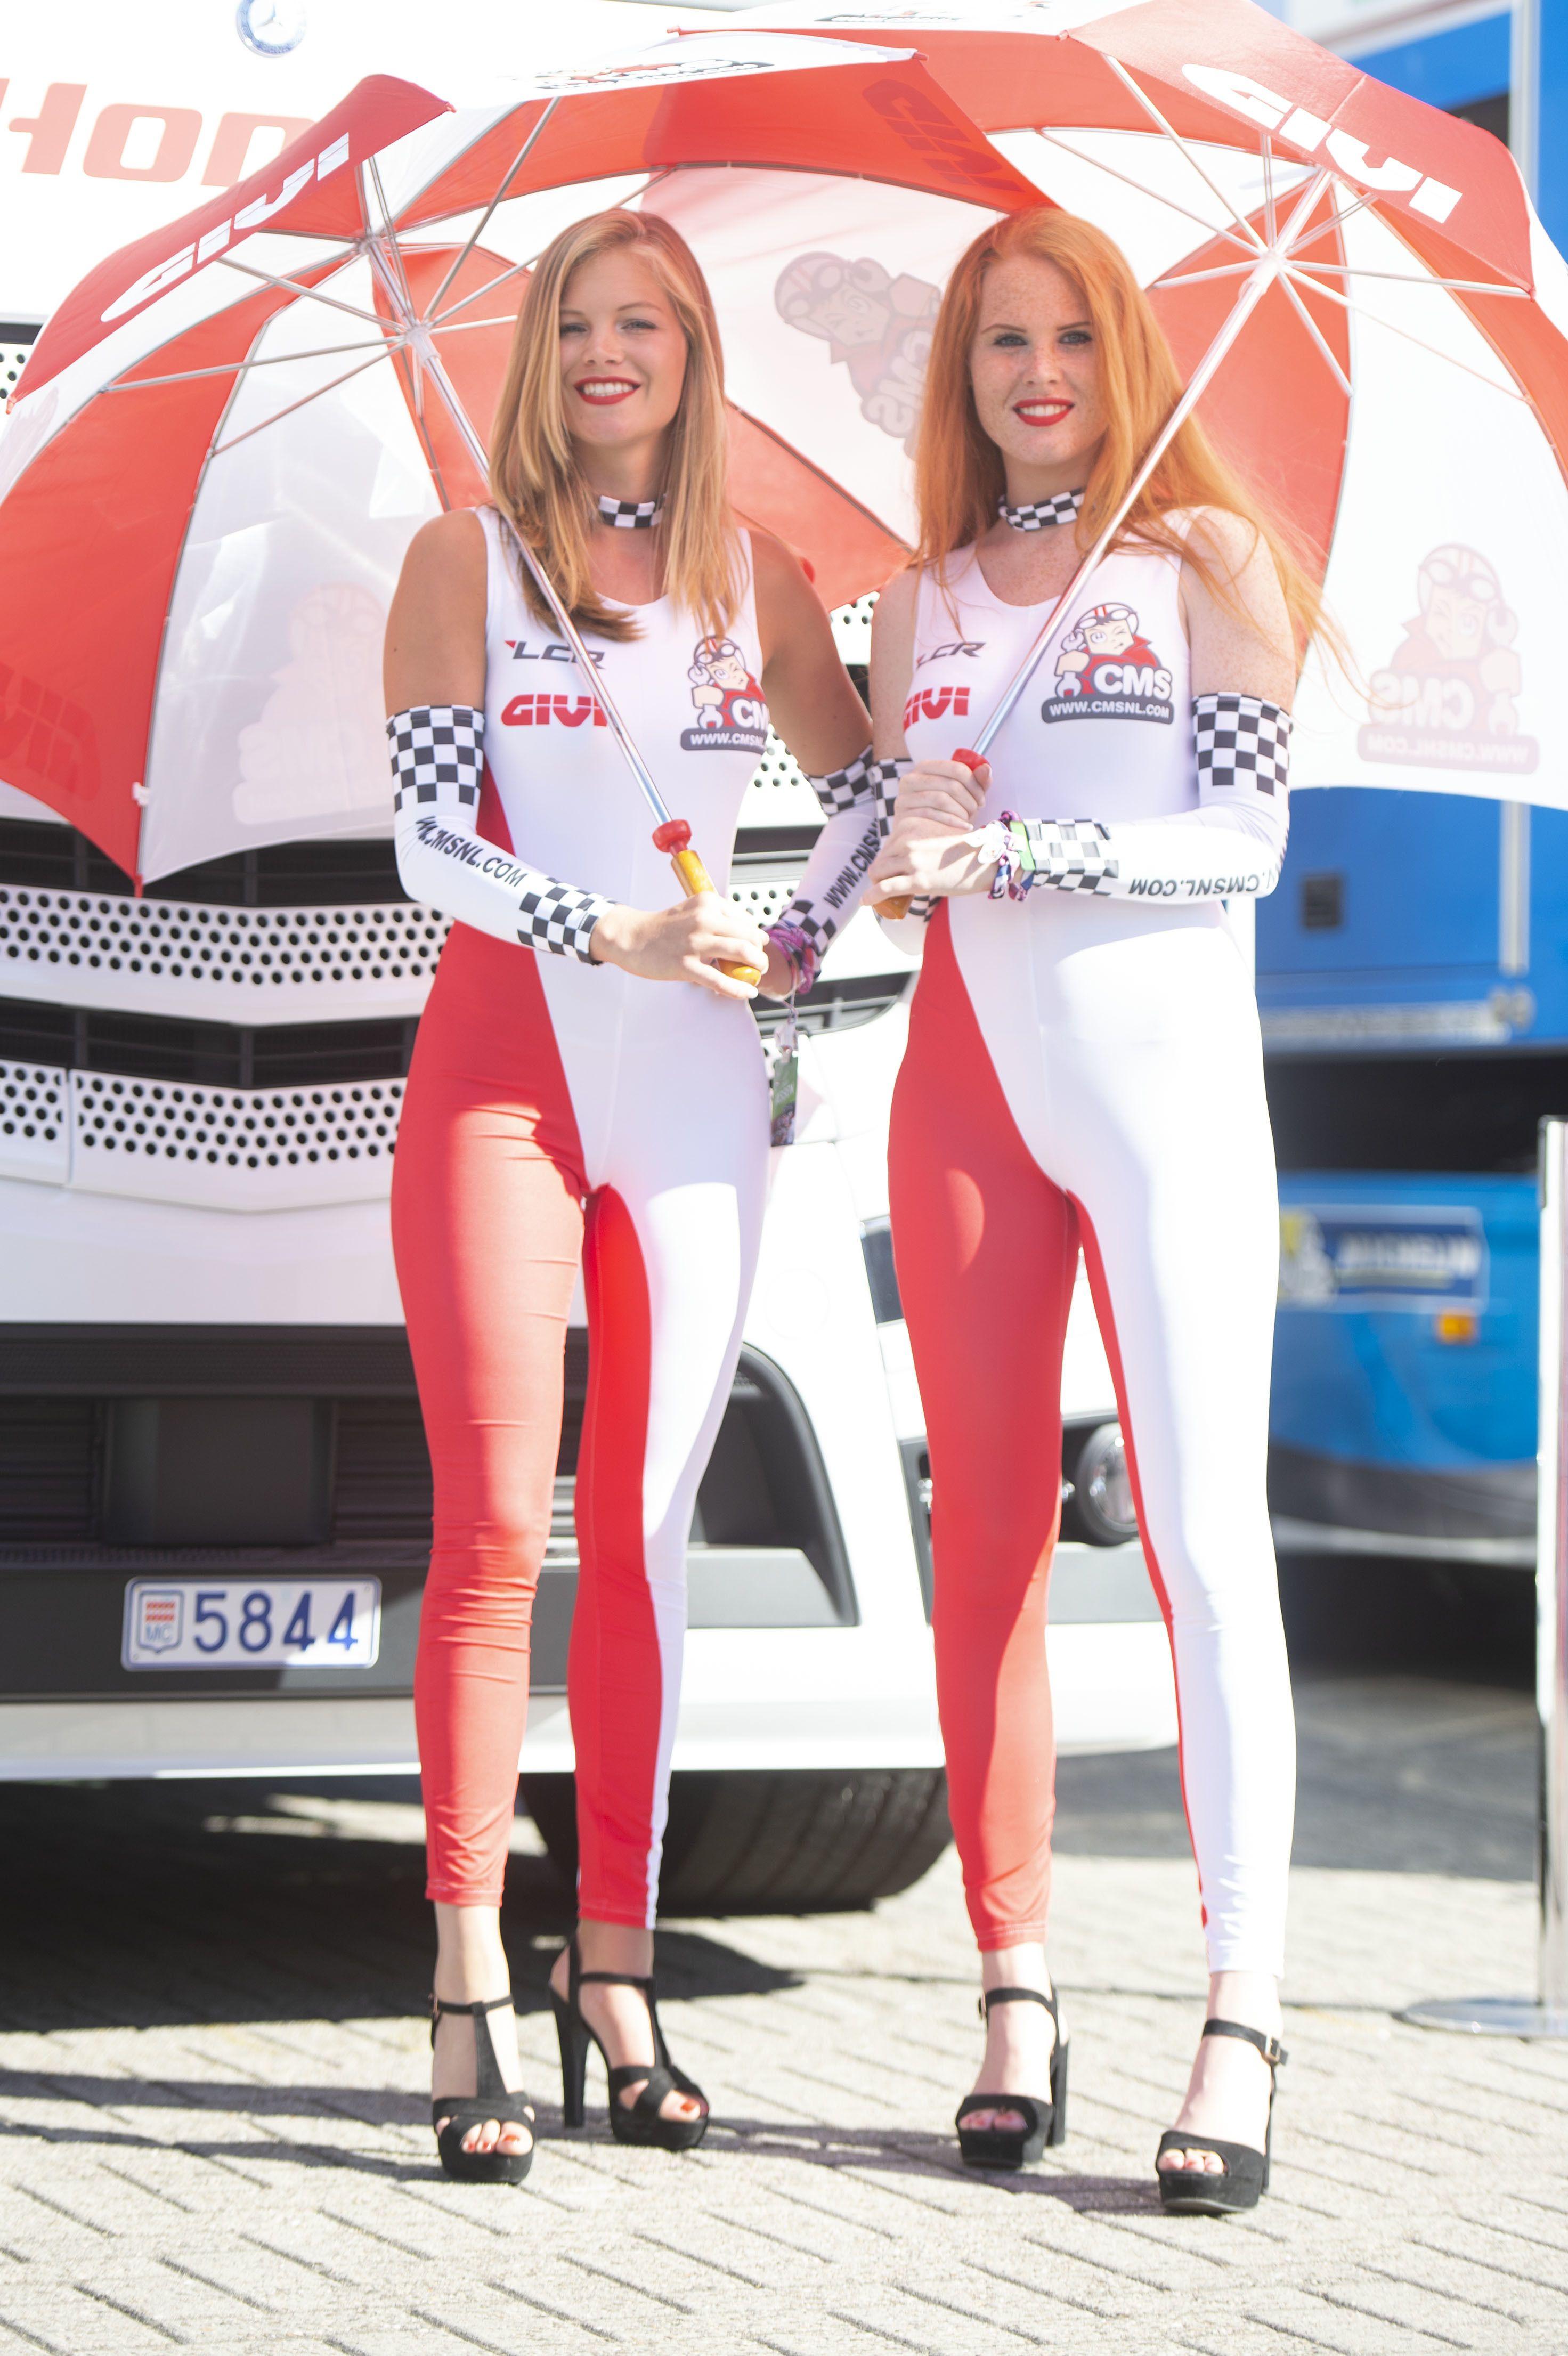 Moto Gp Paddock Girls Gridgirlscom Grid Girls Gridgirls Motorsport Motor Beauties Love Model Paddock Girls Racing Girl Grid Girls